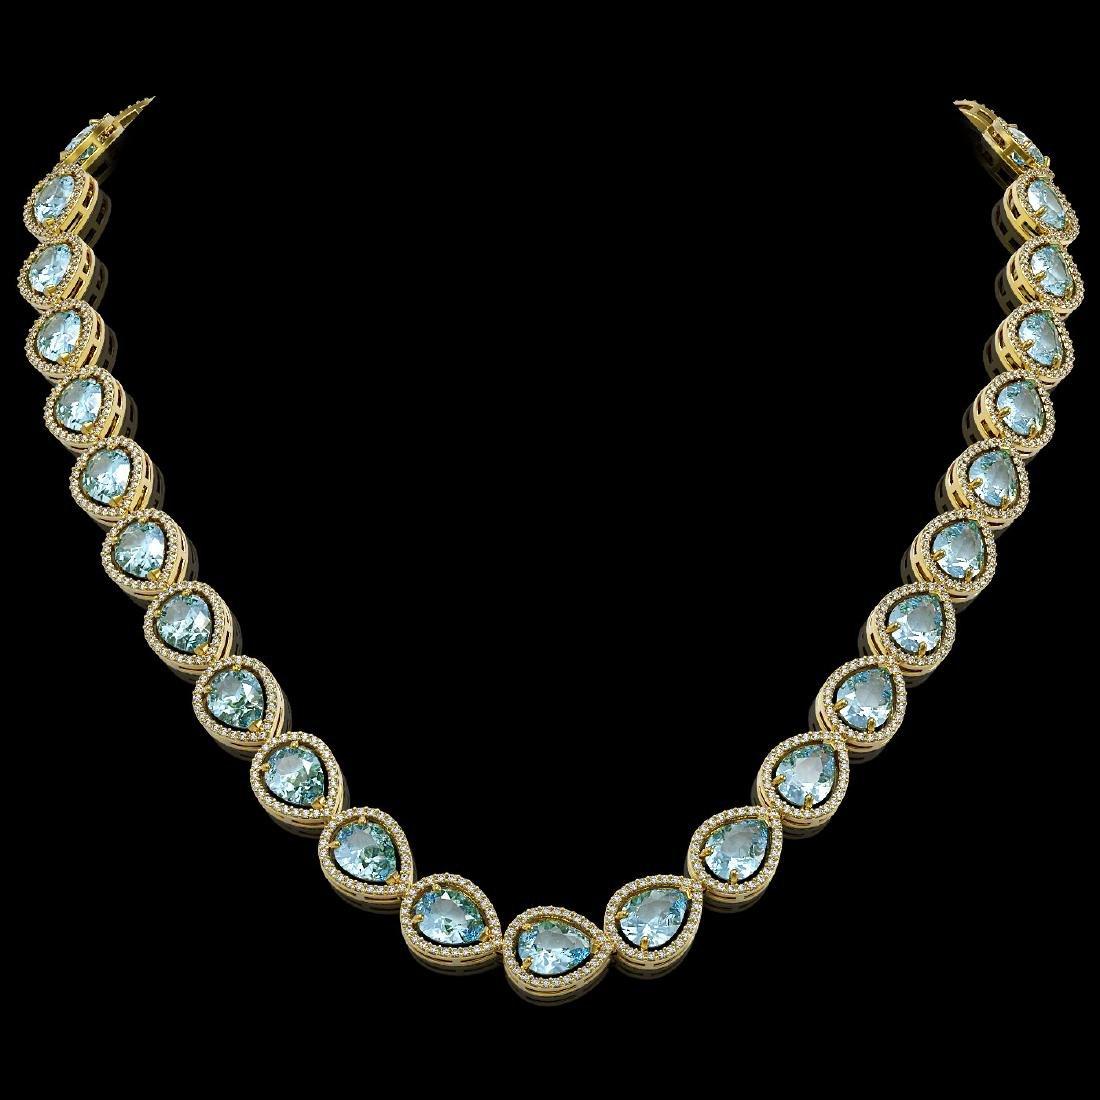 41.6 CTW Aquamarine & Diamond Halo Necklace 10K Yellow